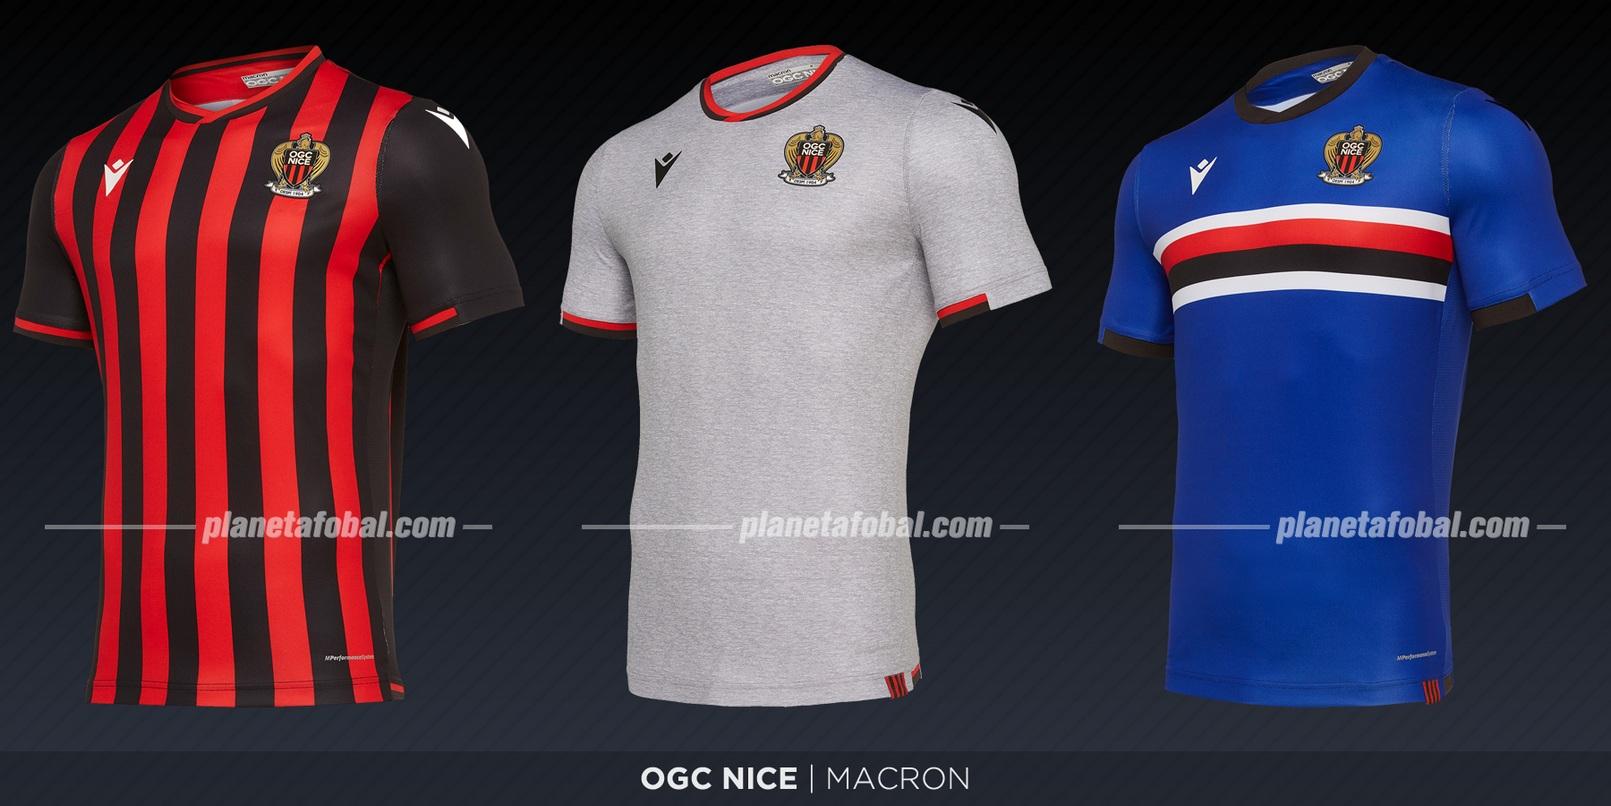 OGC Nice (Macron) | Camisetas de la Ligue 1 2019-2020